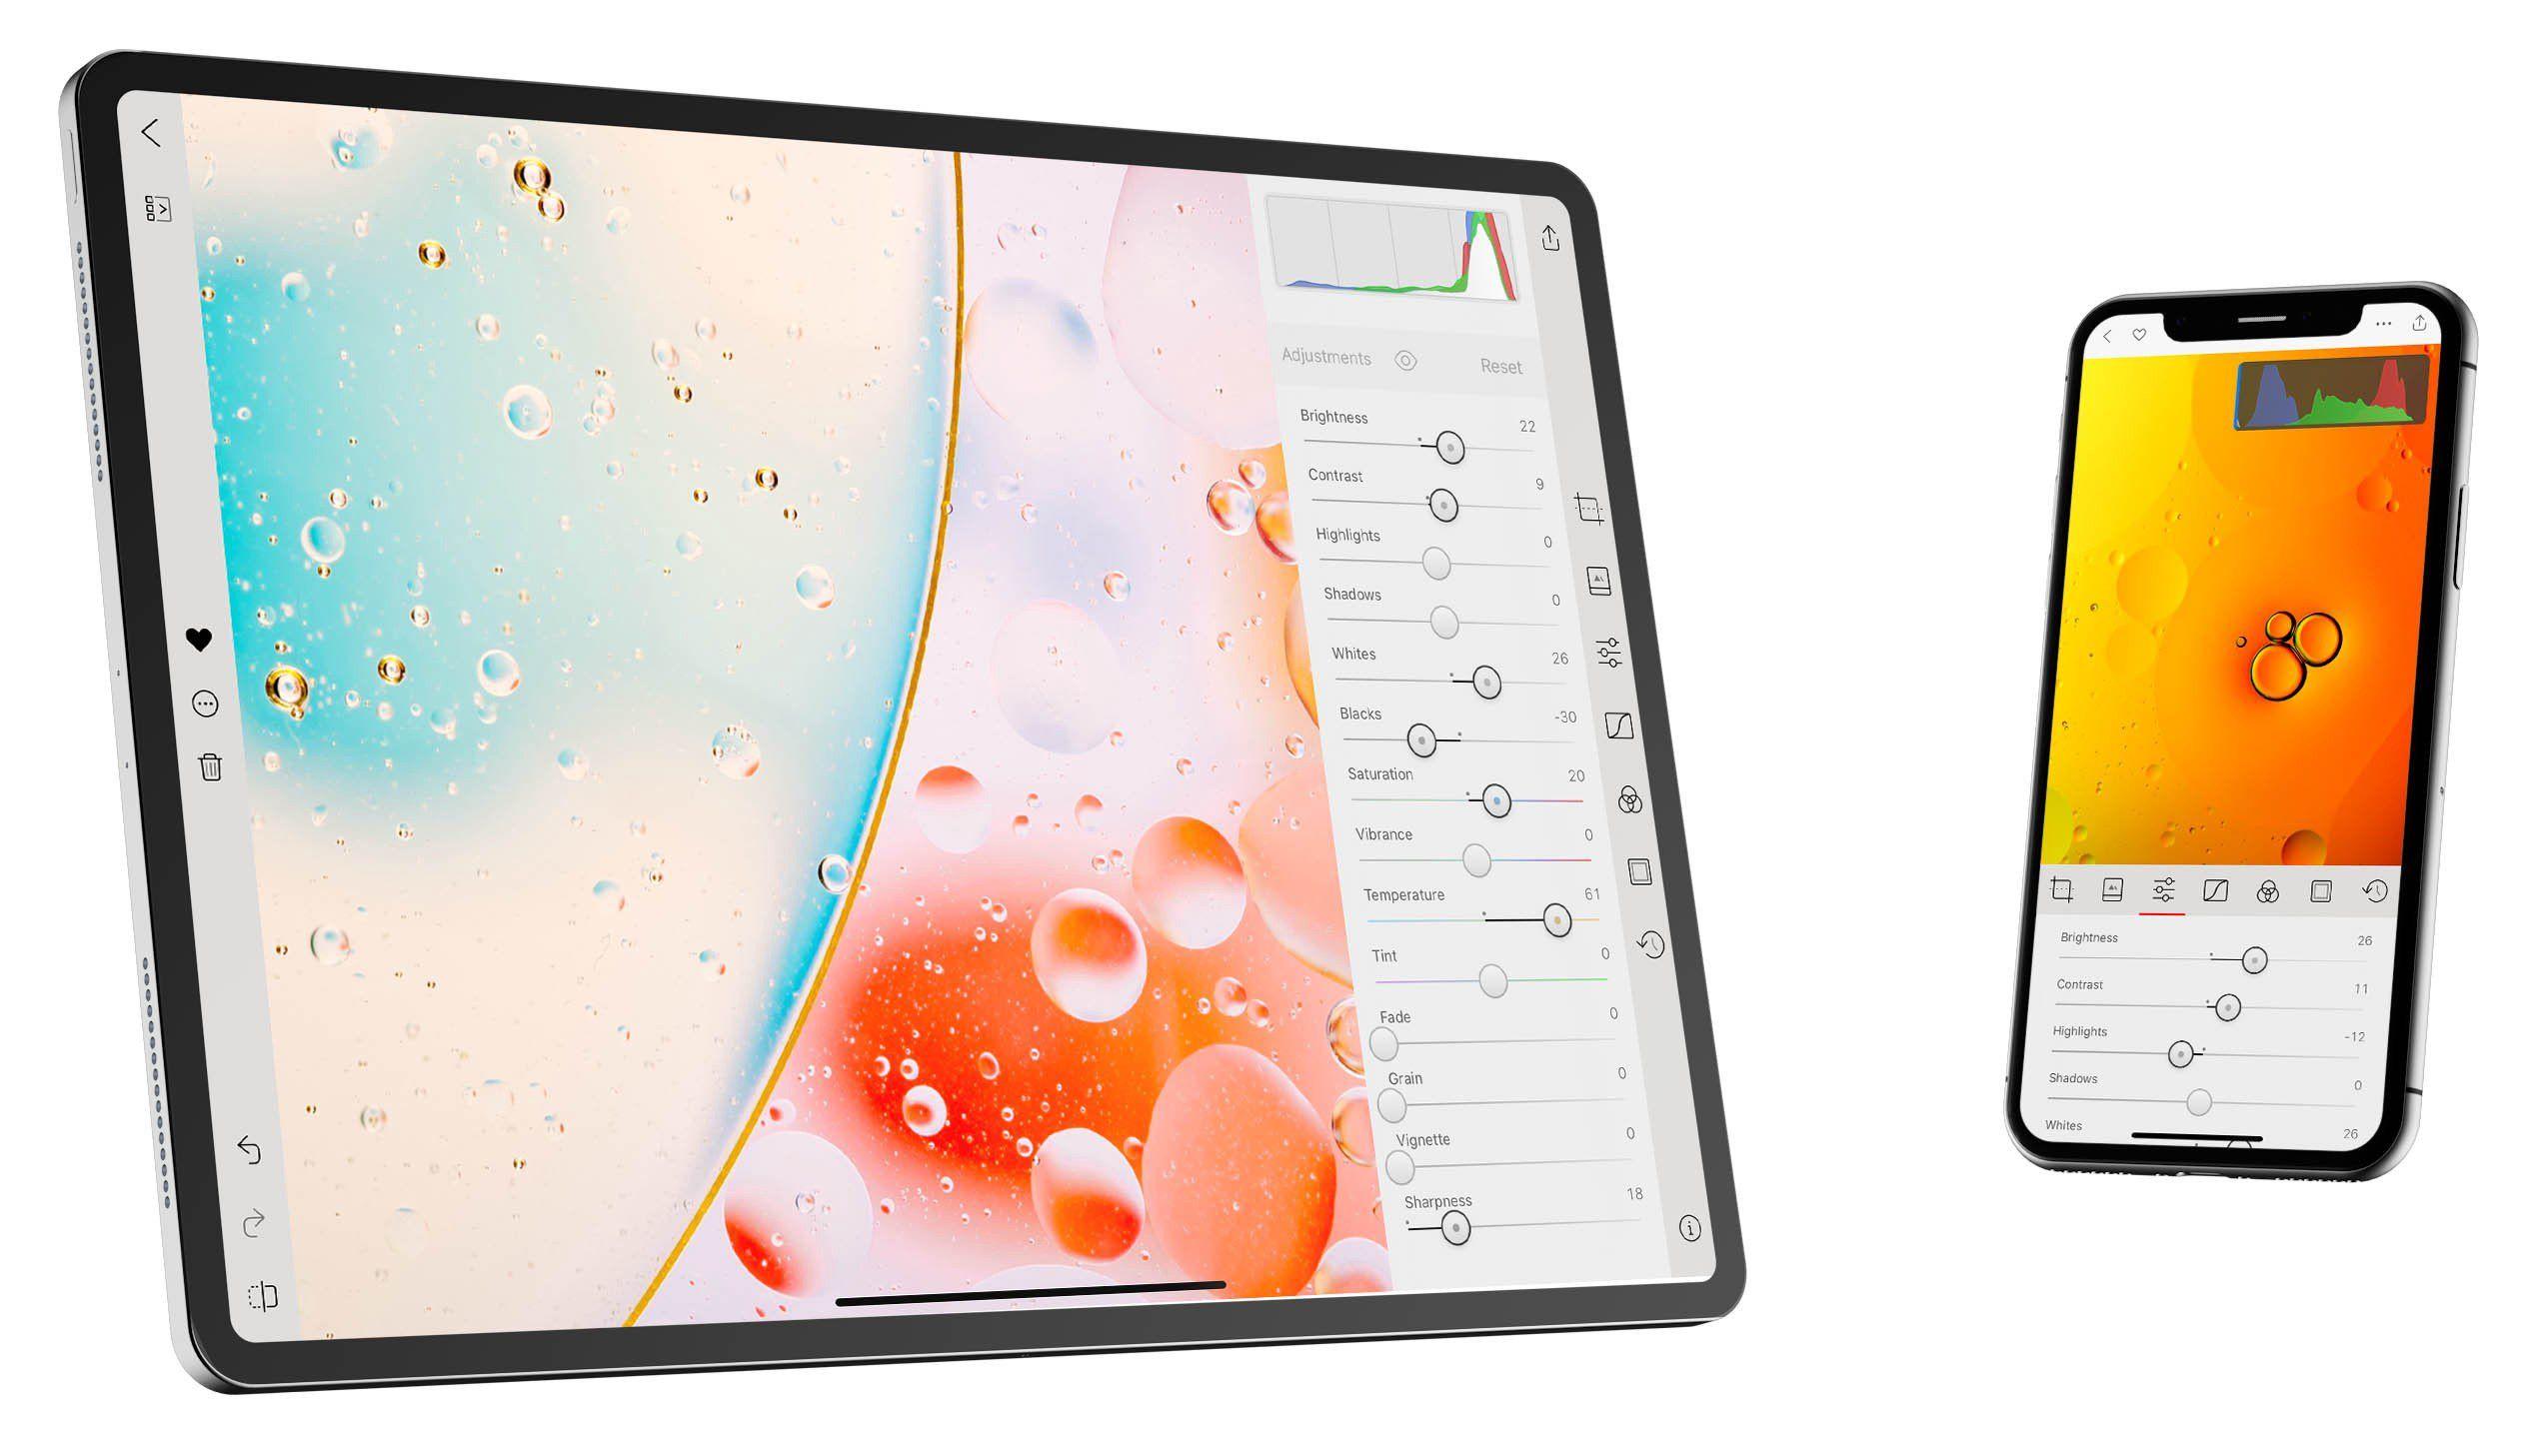 Photo Editor Darkroom Adds Light Mode, More iPad